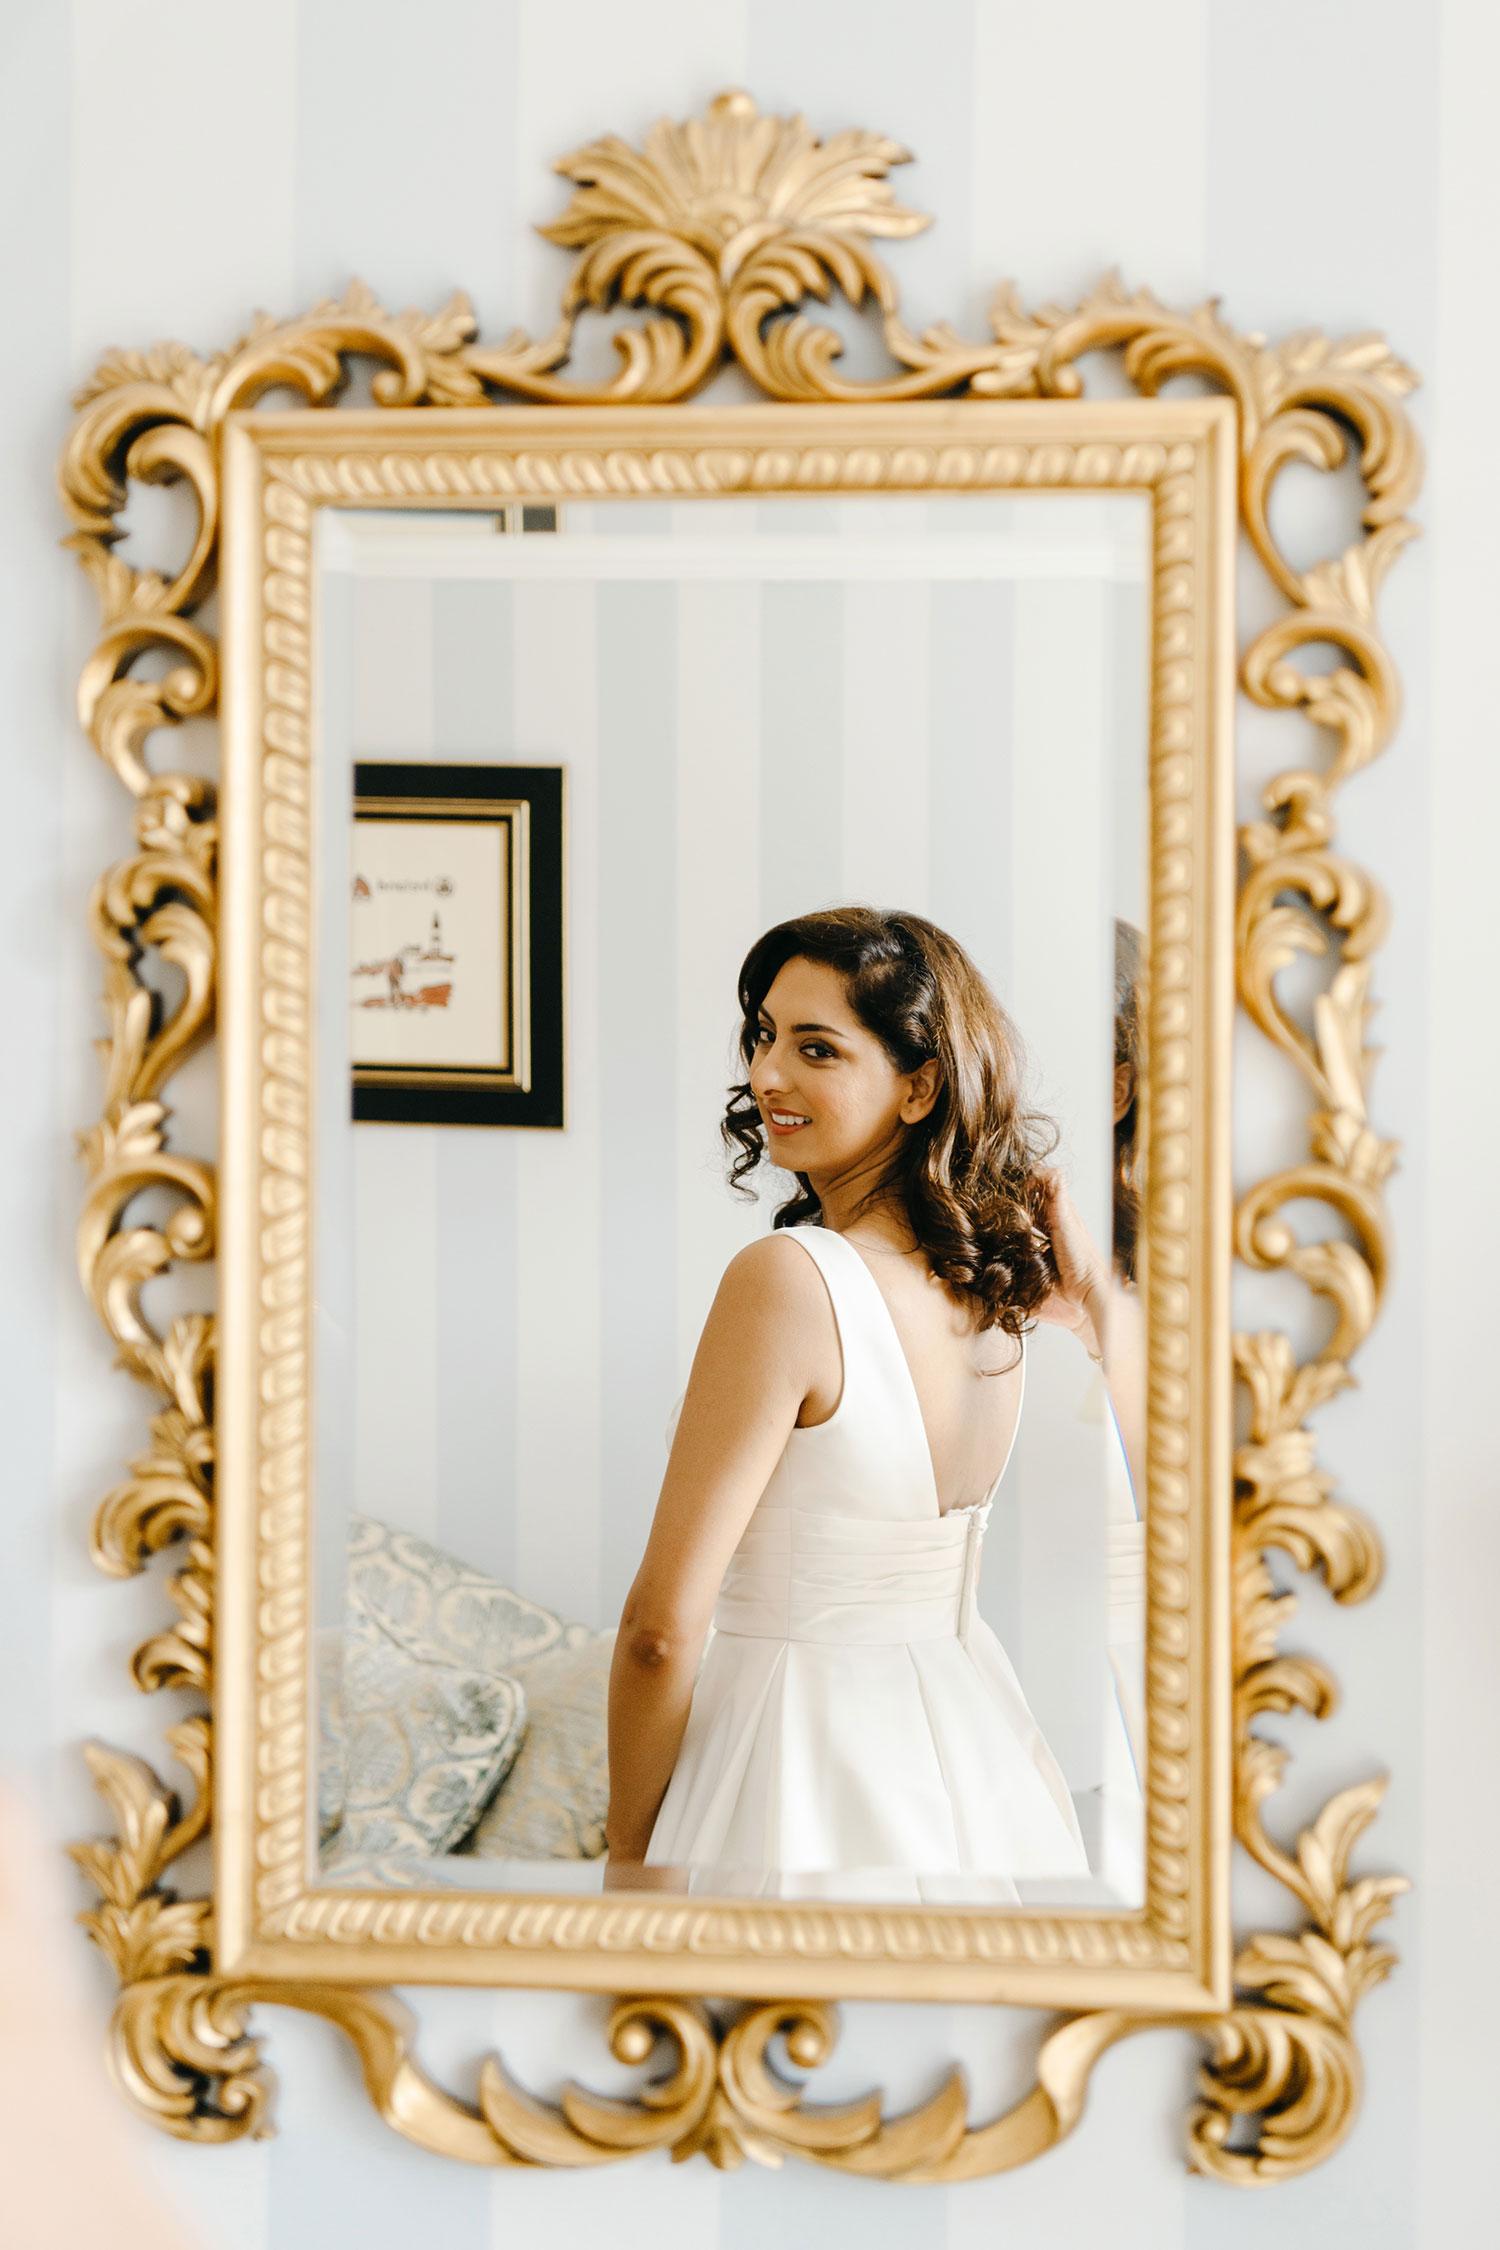 powerscourt-hotel-wedding-photographer-0036_0786.jpg